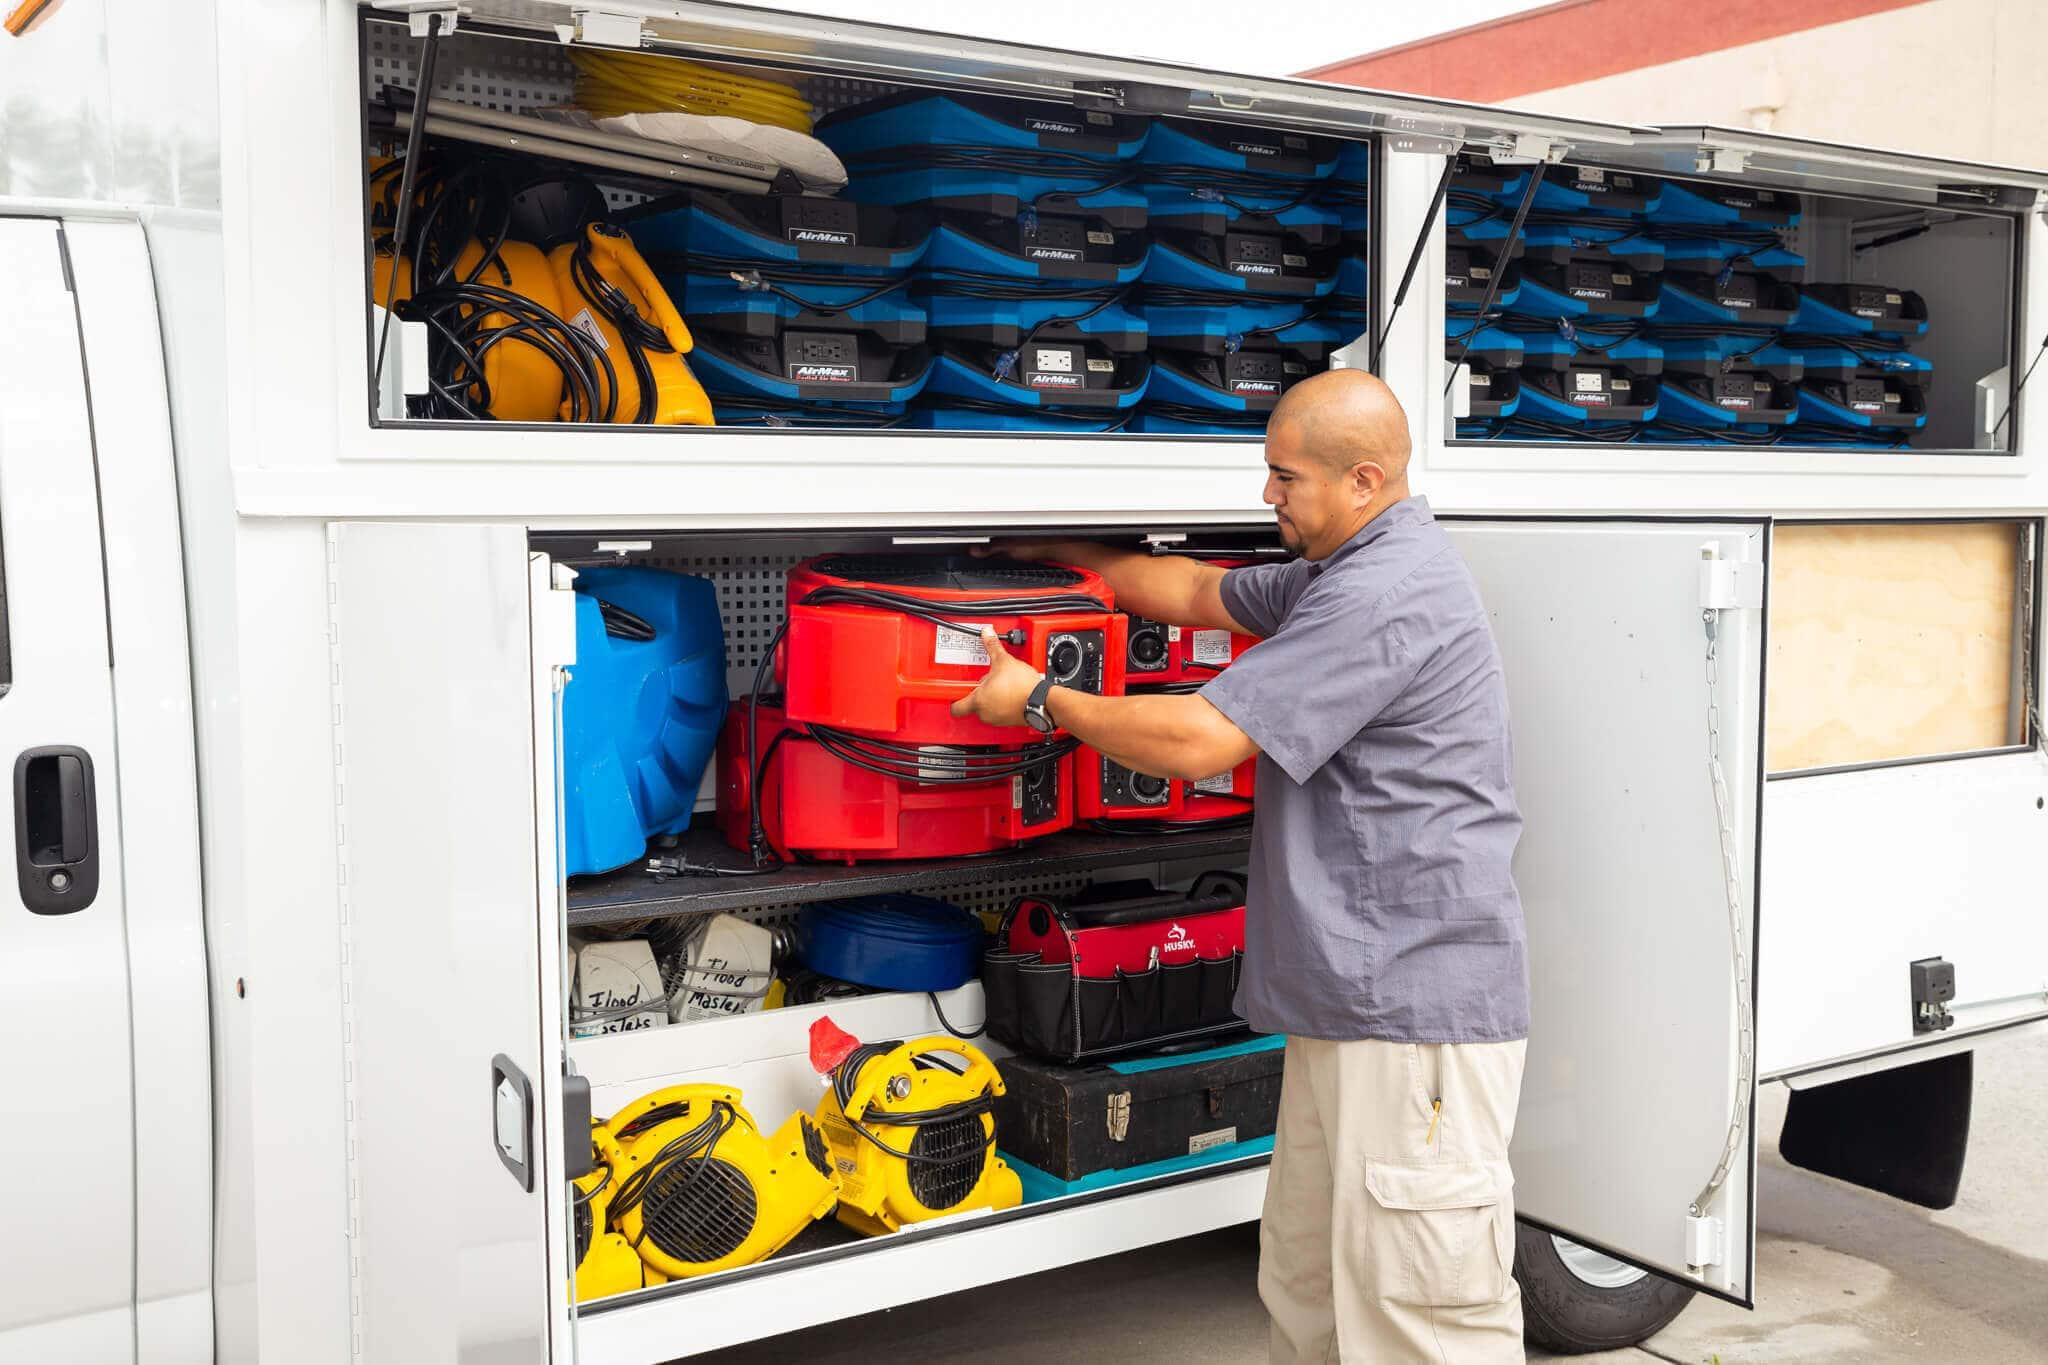 Water damage restoration cleanup equipment